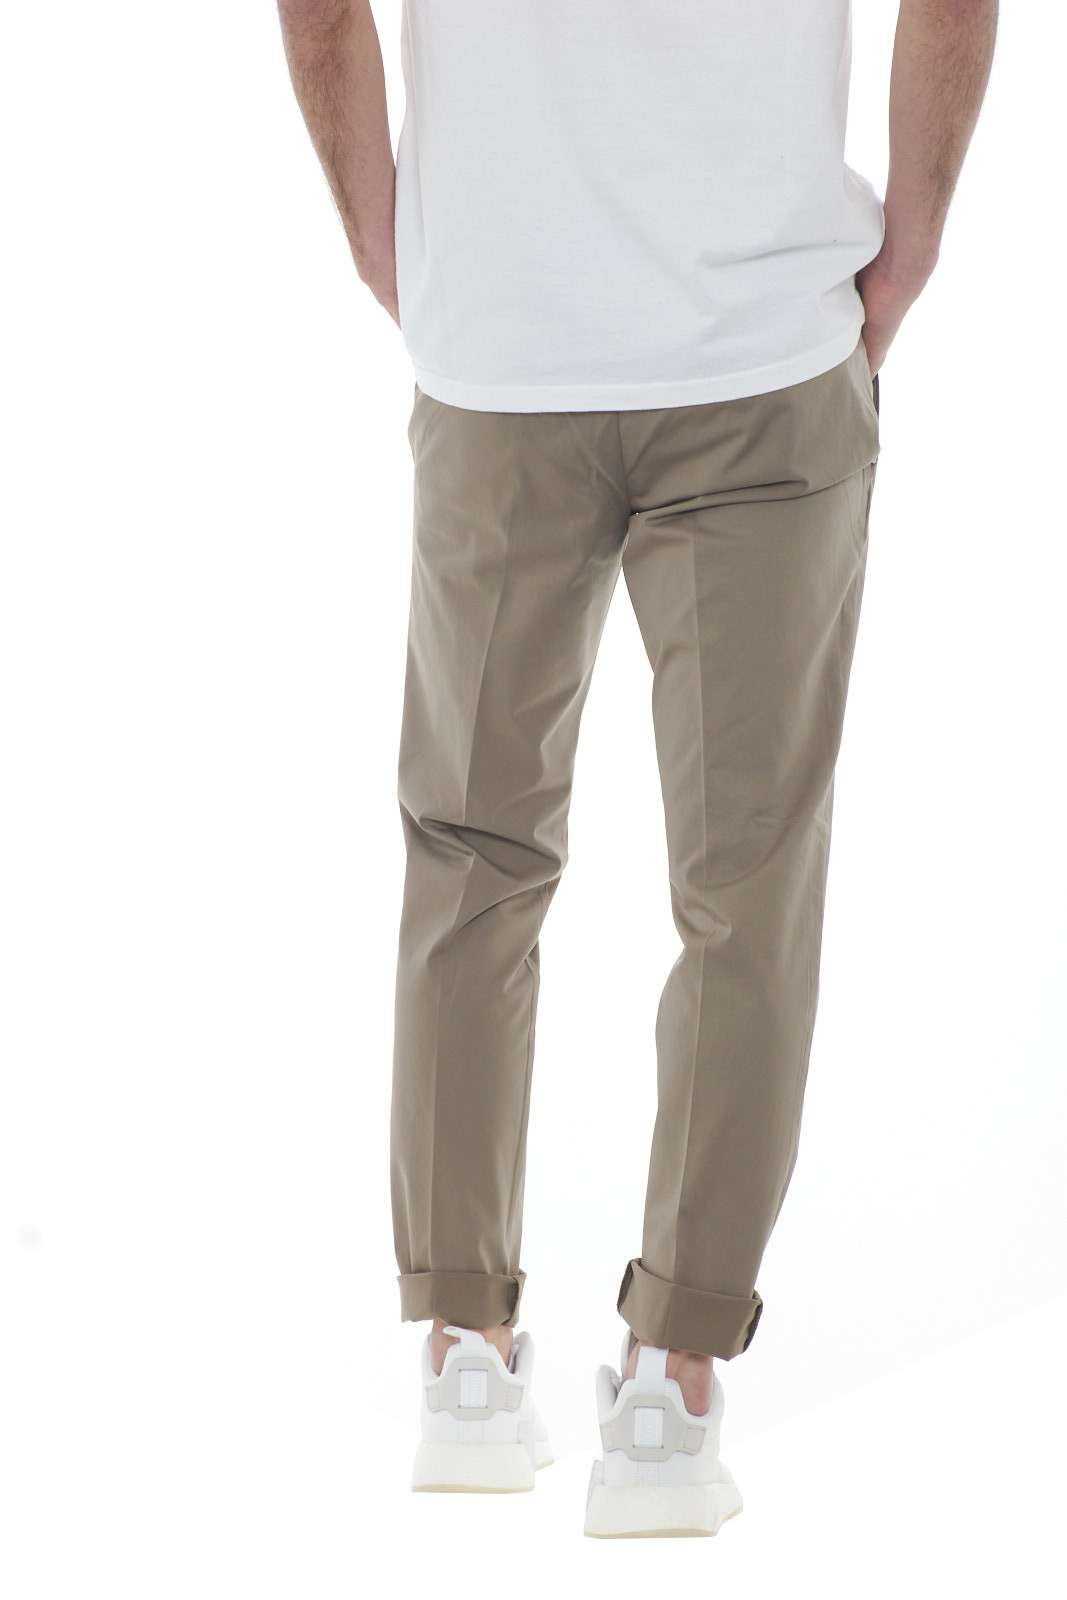 https://www.parmax.com/media/catalog/product/a/i/PE-outlet_parmax-pantaloni-uomo-Desica-POSITANORASO-C.jpg